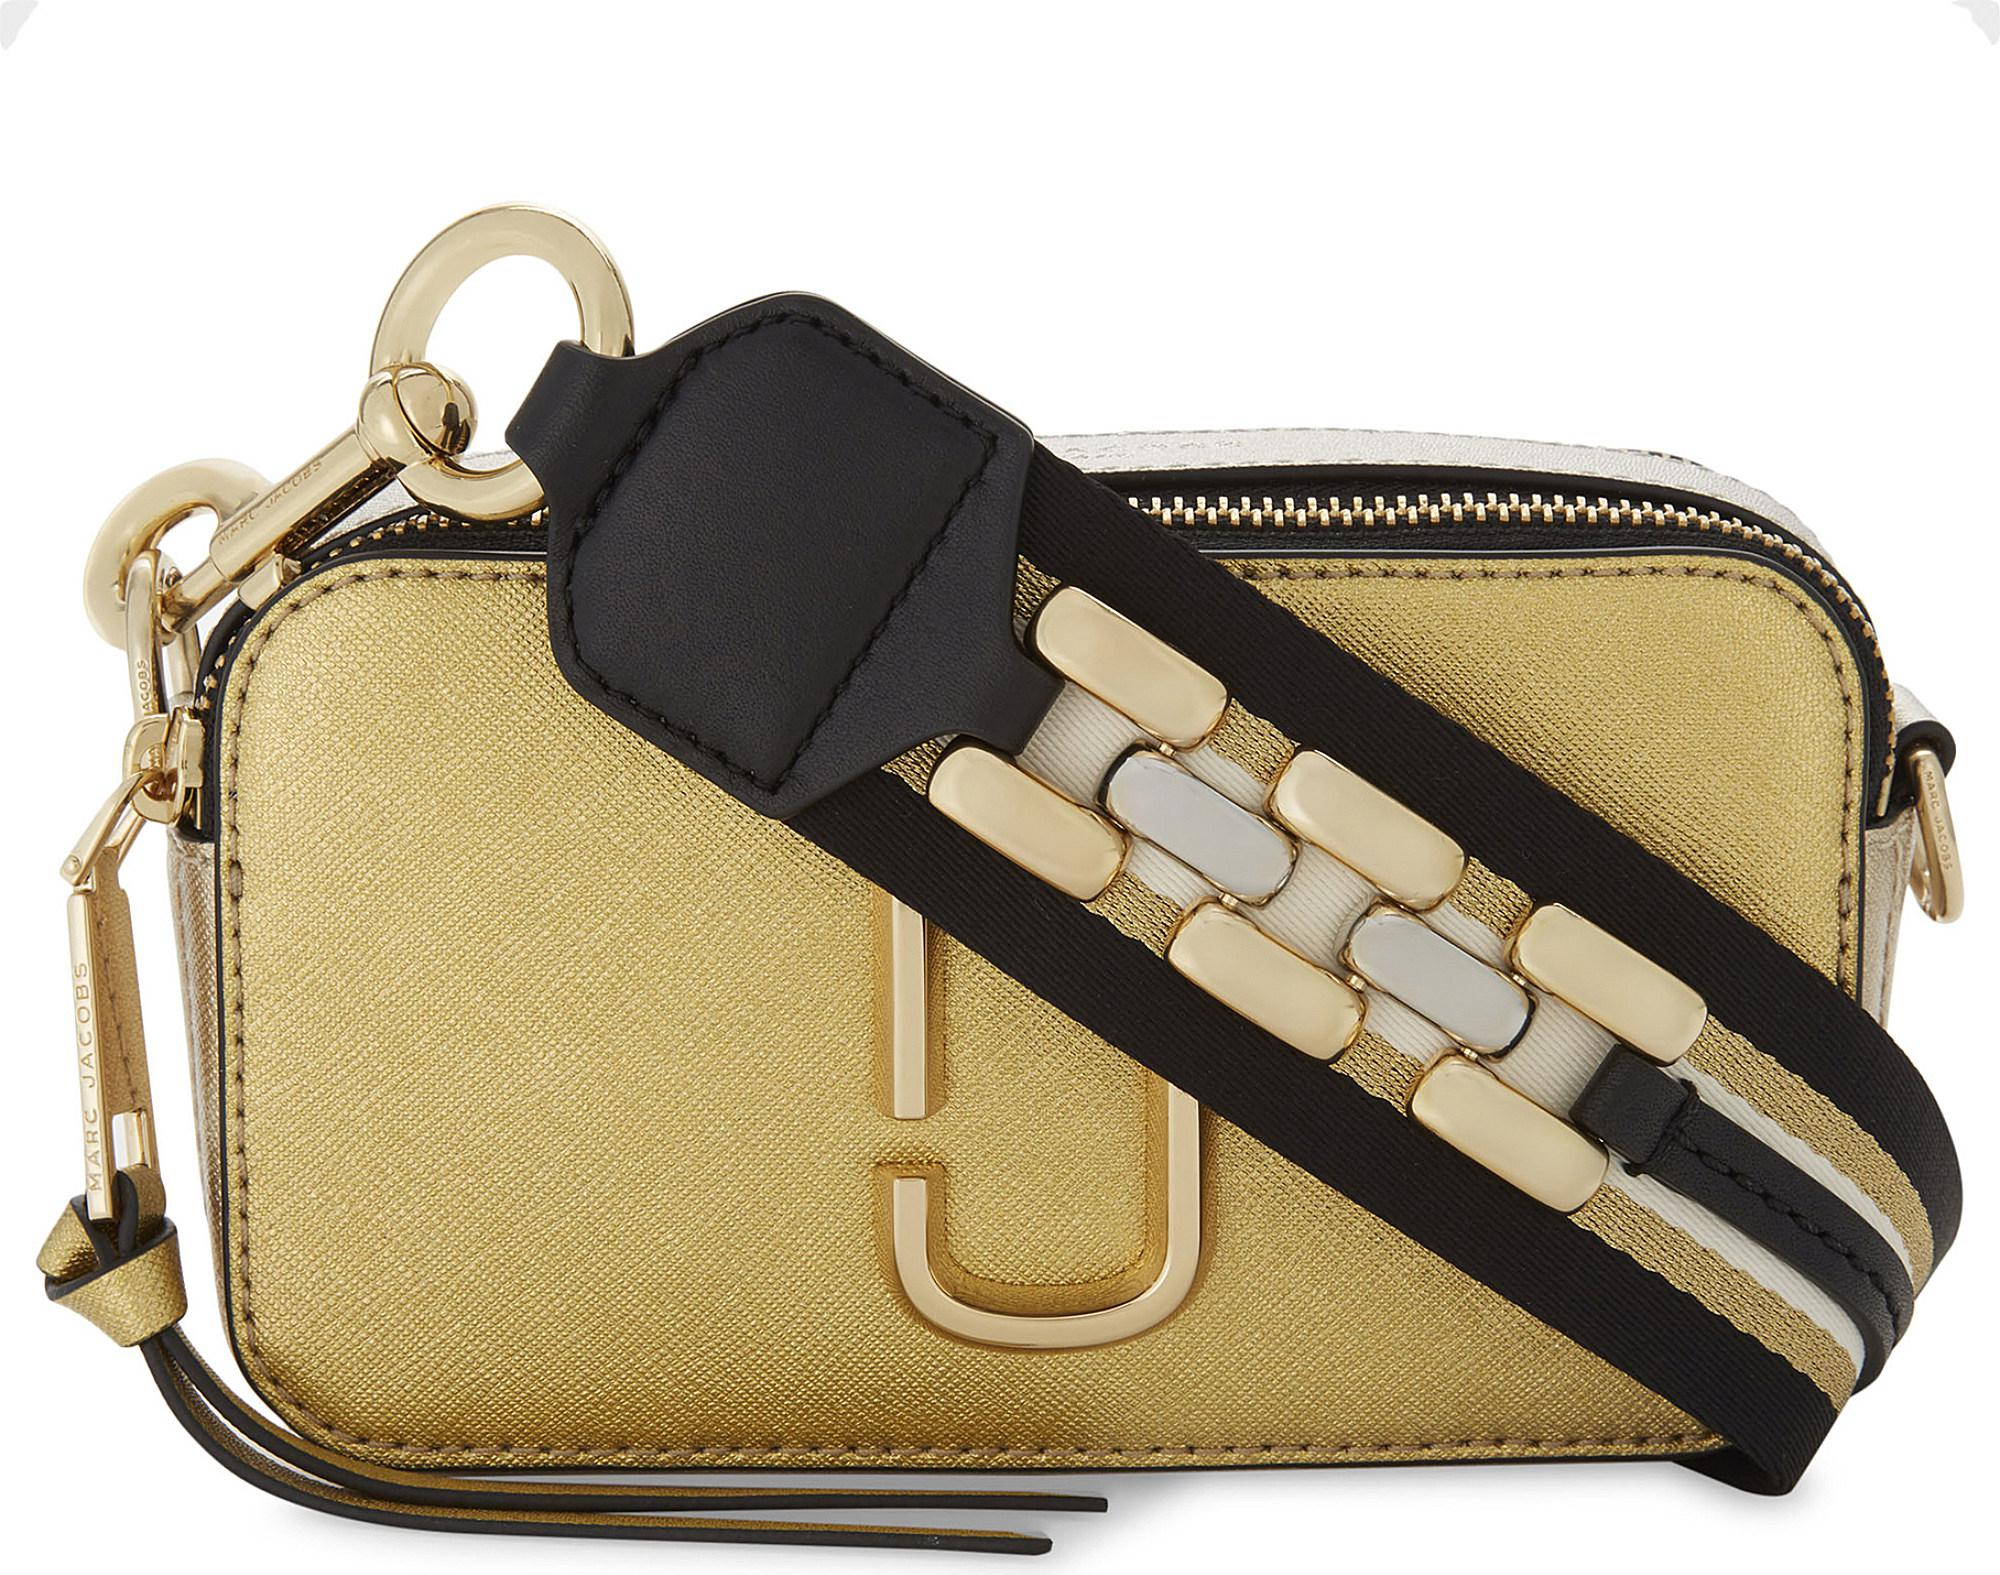 efe384c96dd Marc Jacobs Snapshot Metallic Leather Camera Bag in Metallic - Lyst